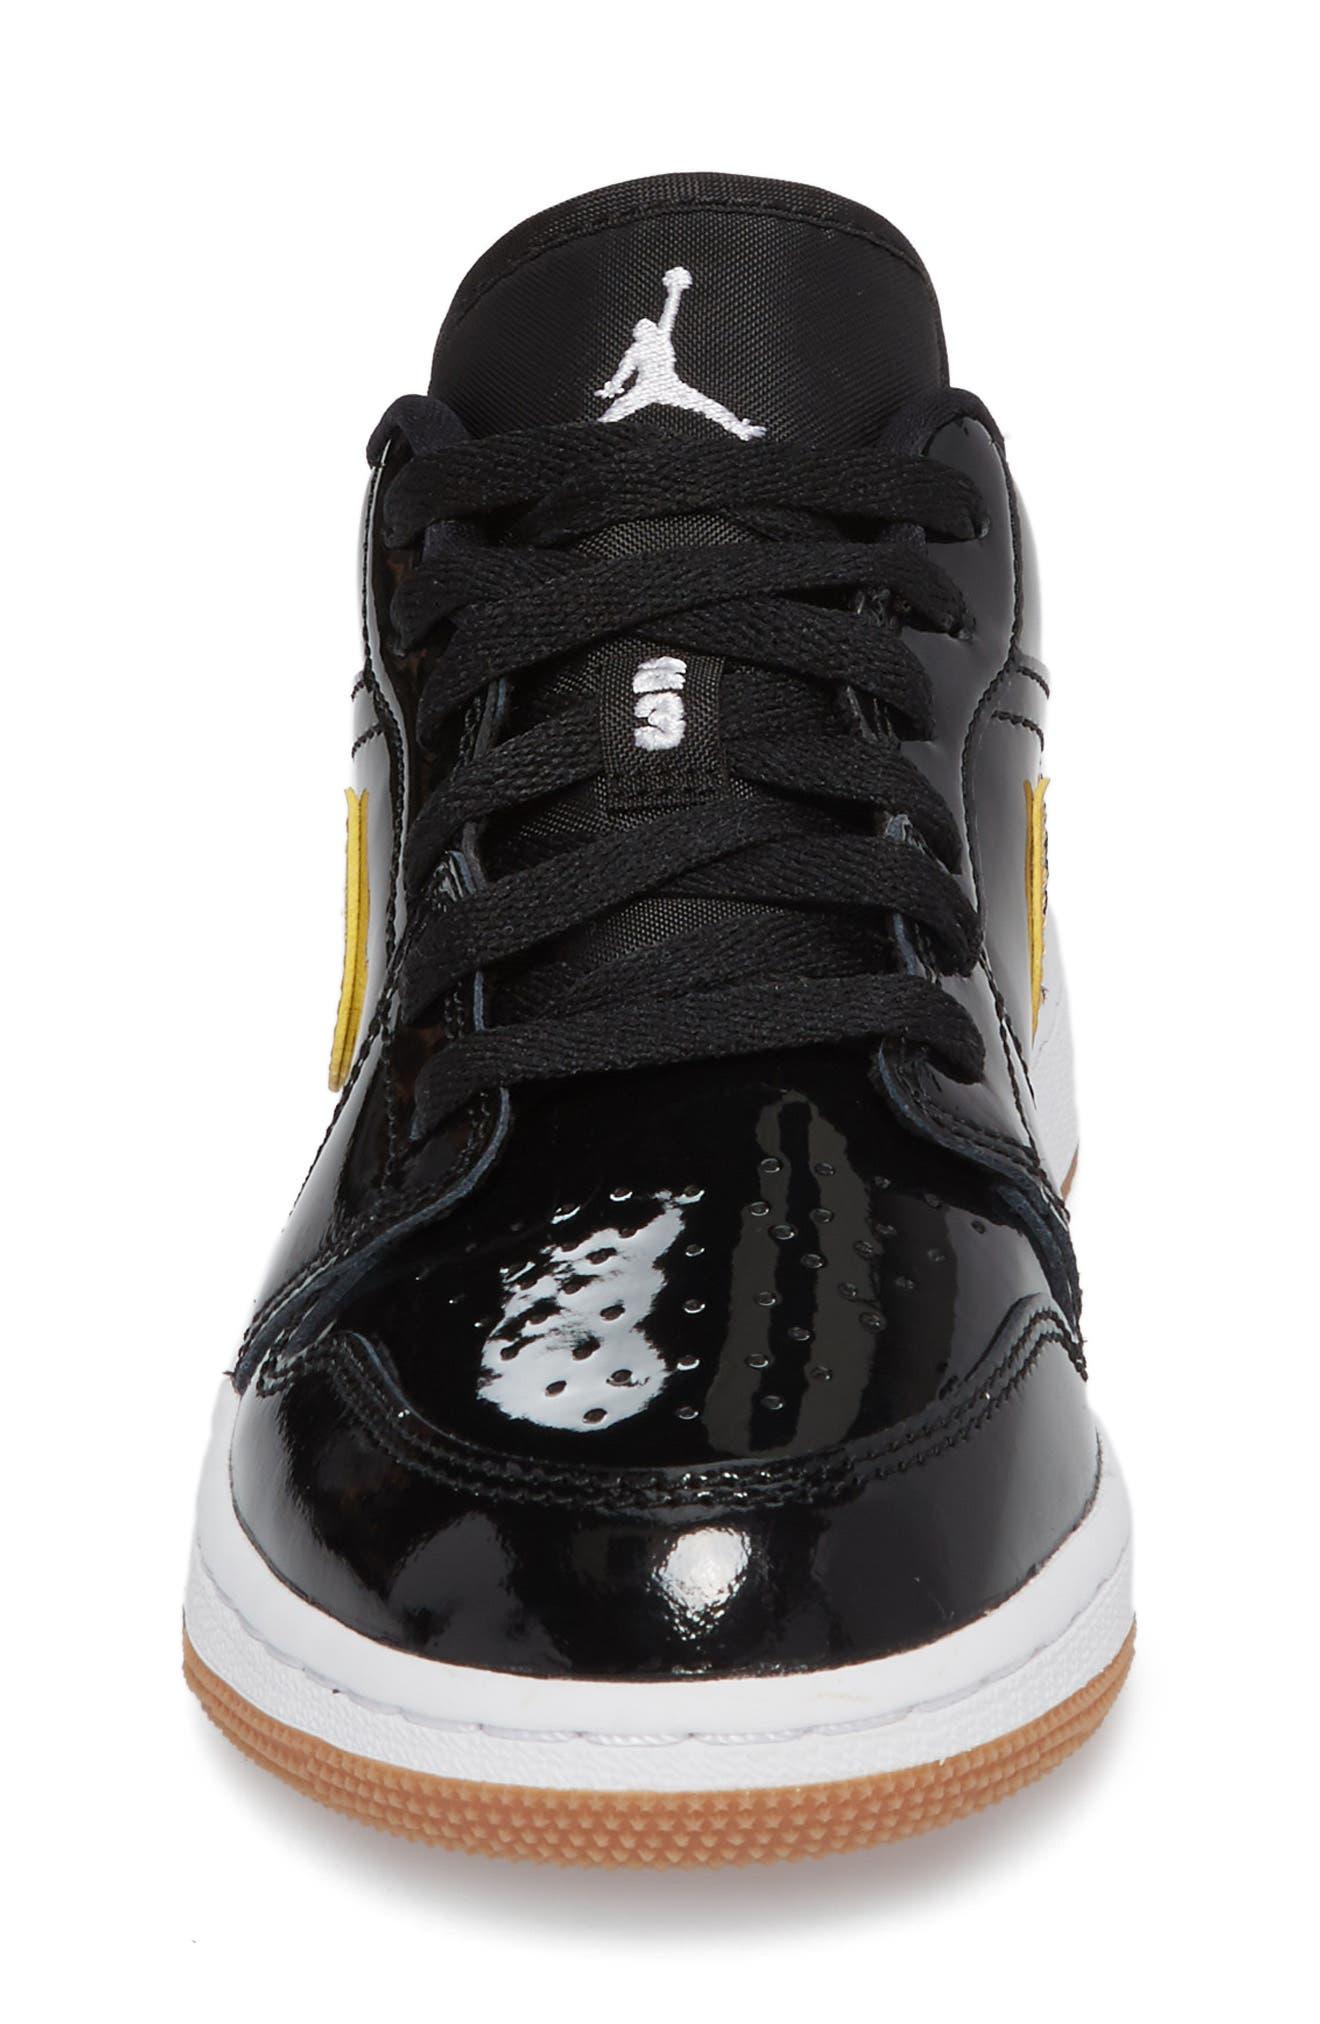 Nike 'Jordan 1 Low' Basketball Shoe,                             Alternate thumbnail 4, color,                             Black/ Metallic Gold/ White